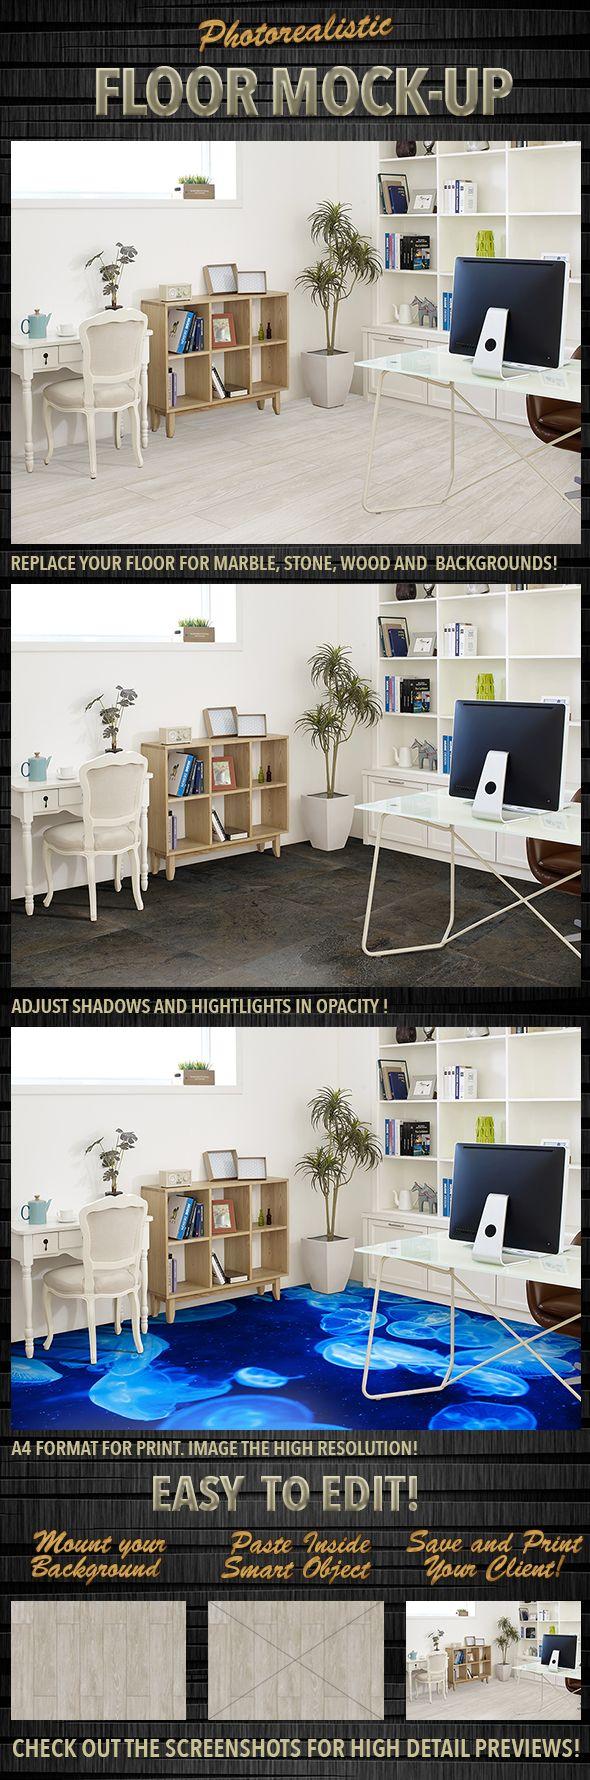 Photorealistic Floor MockUp Mockup, Mockup design